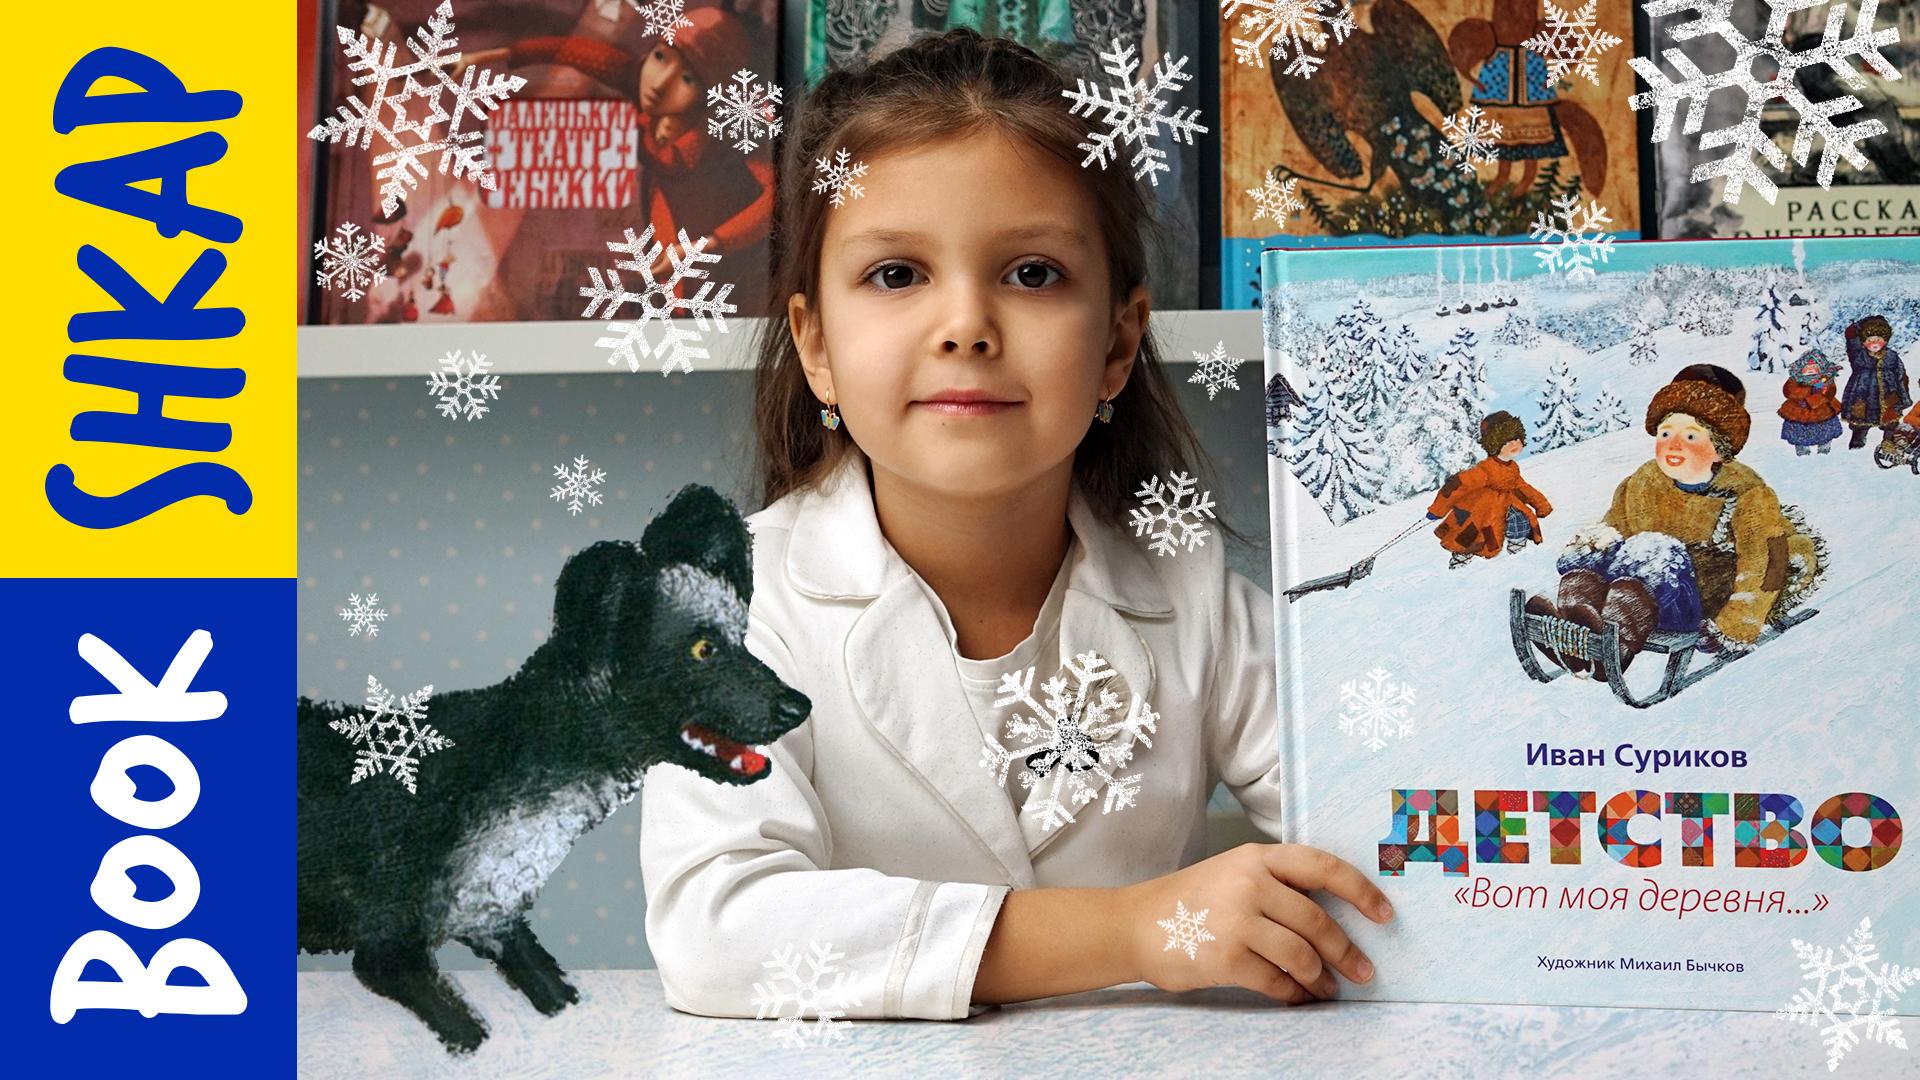 surikov-detstvo